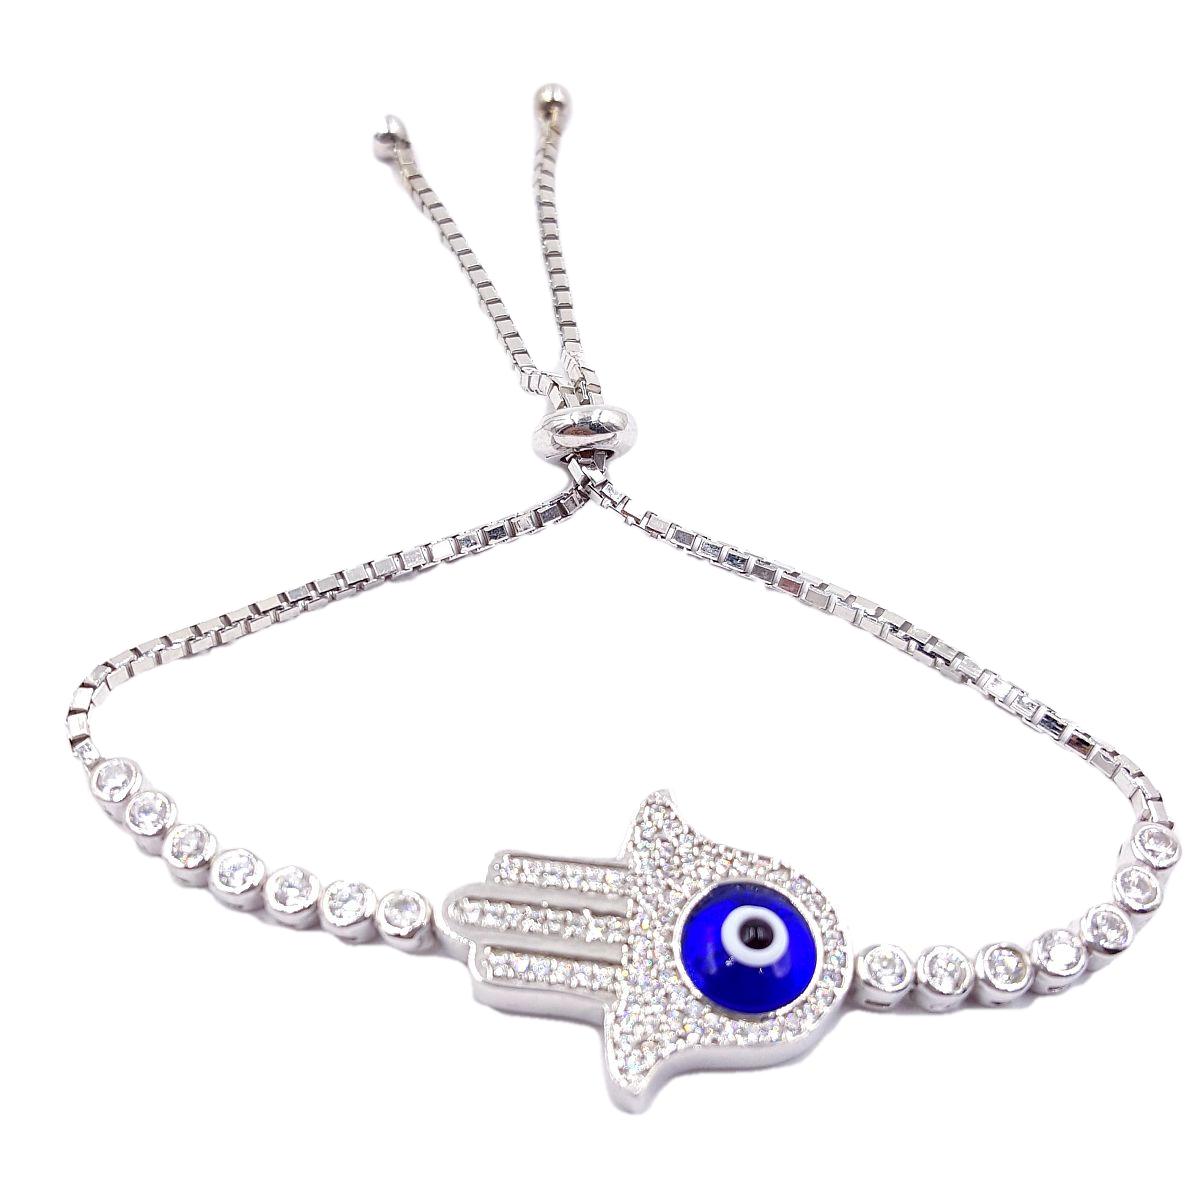 Eye High Quality 925 Sterling Silver Hamsa Bracelet